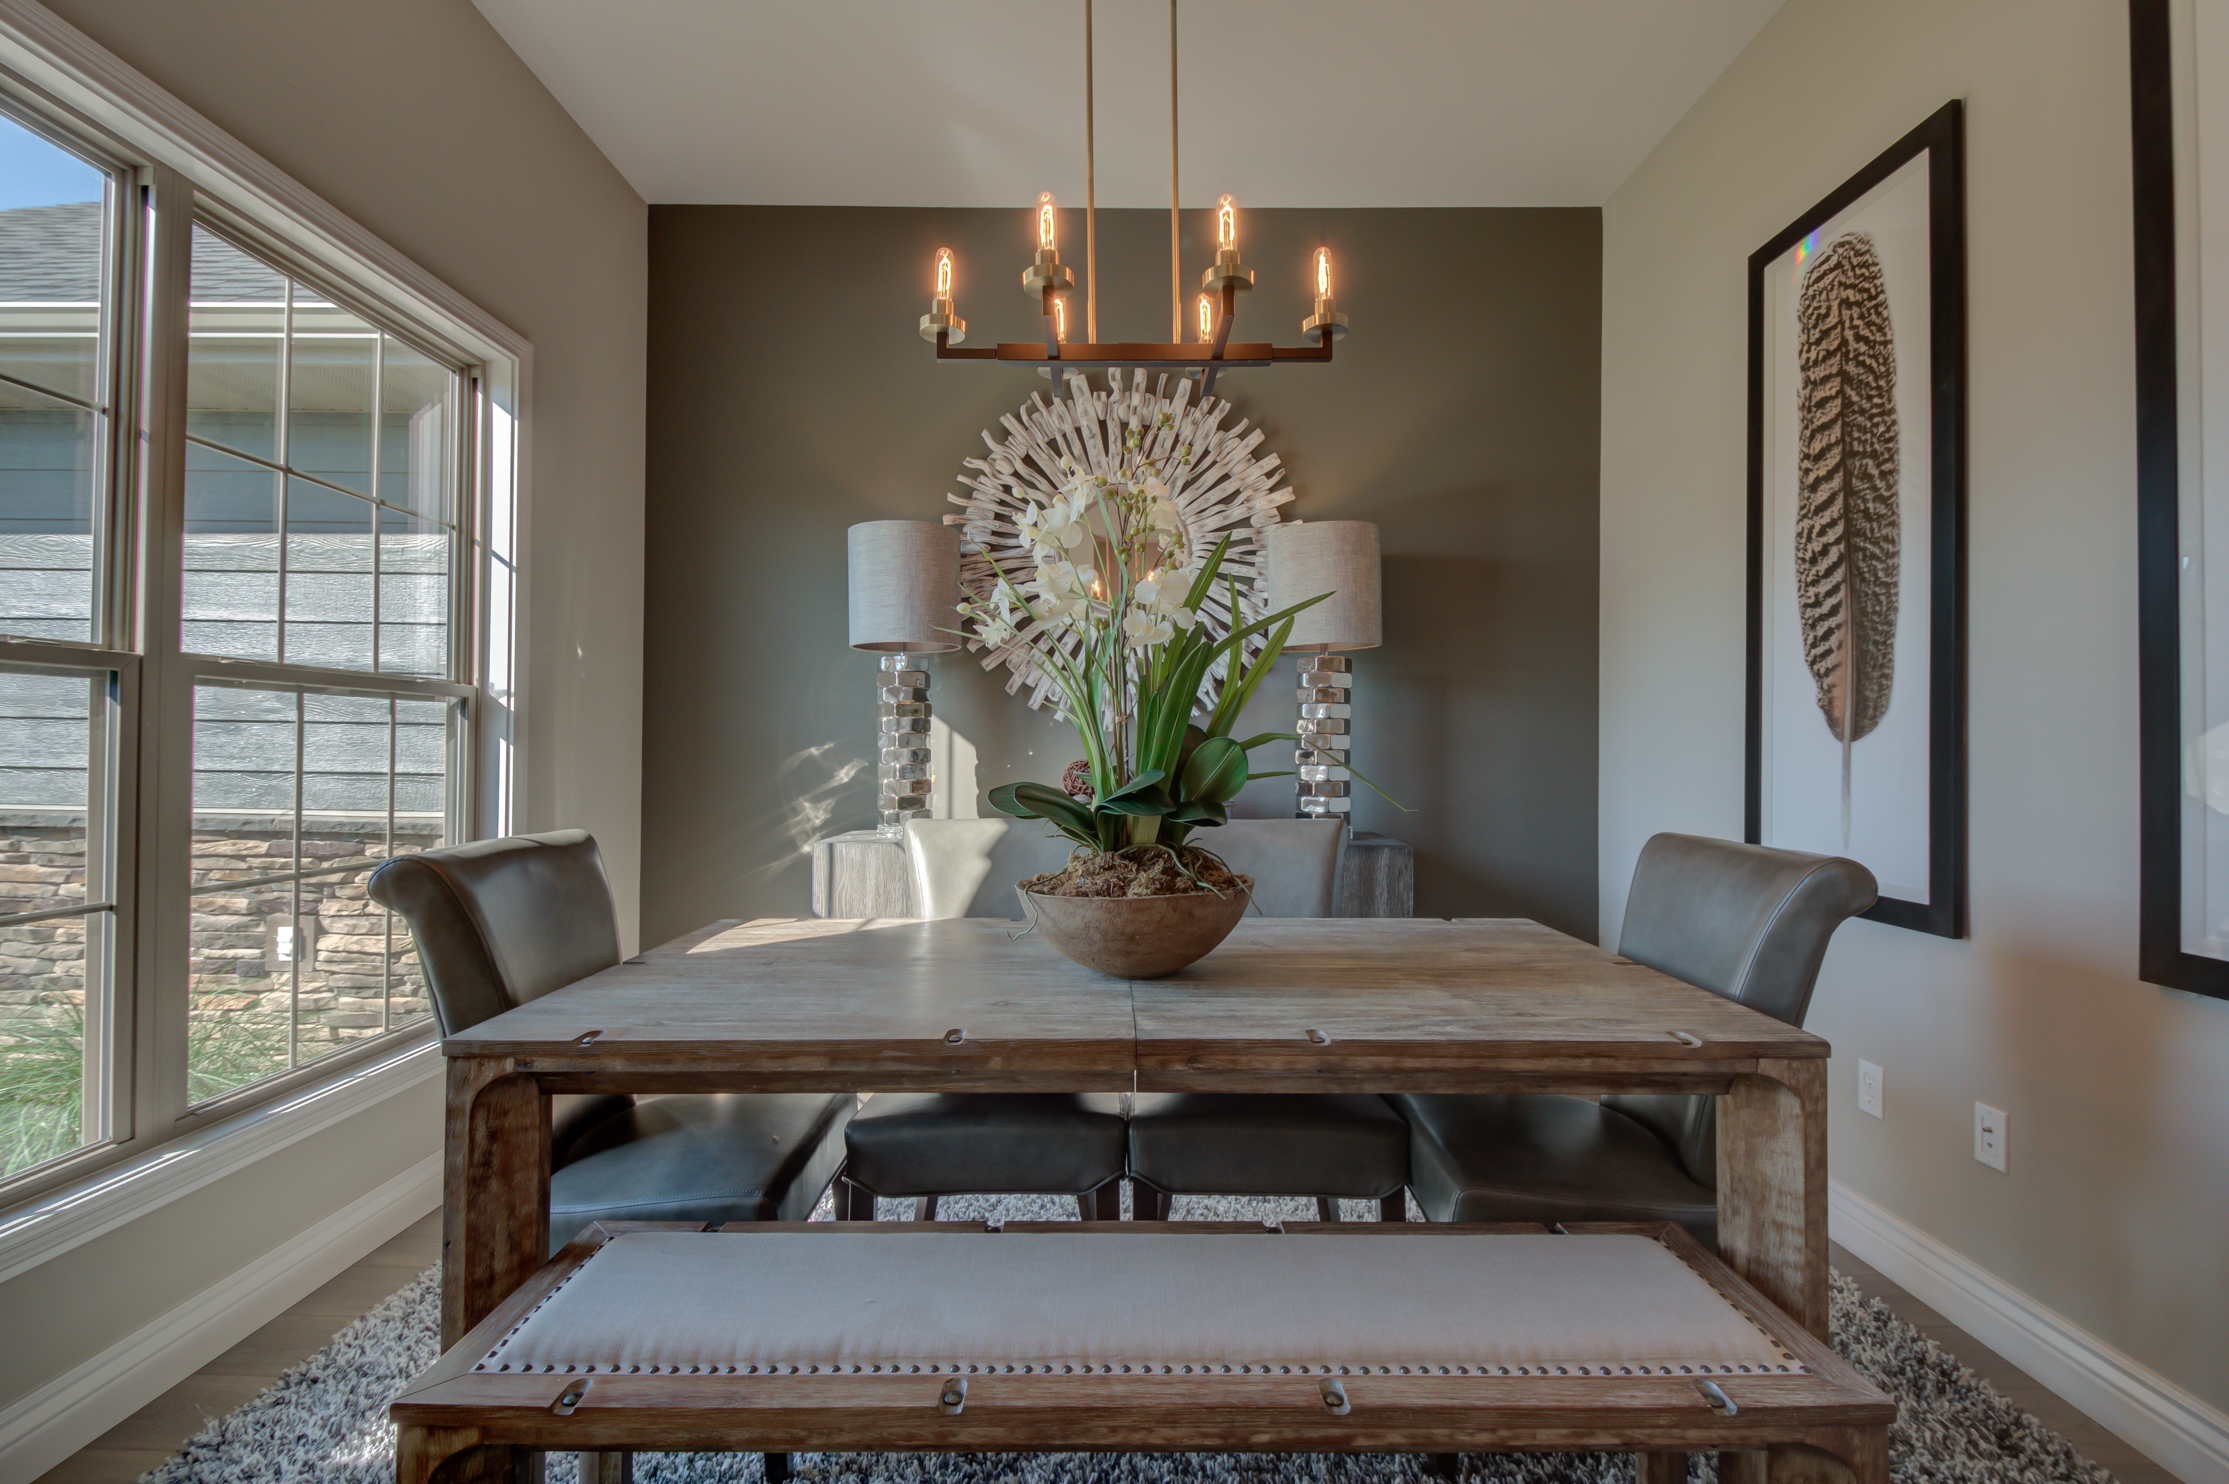 Dining_Room_New_Home_Breckenridge_Park.jpg